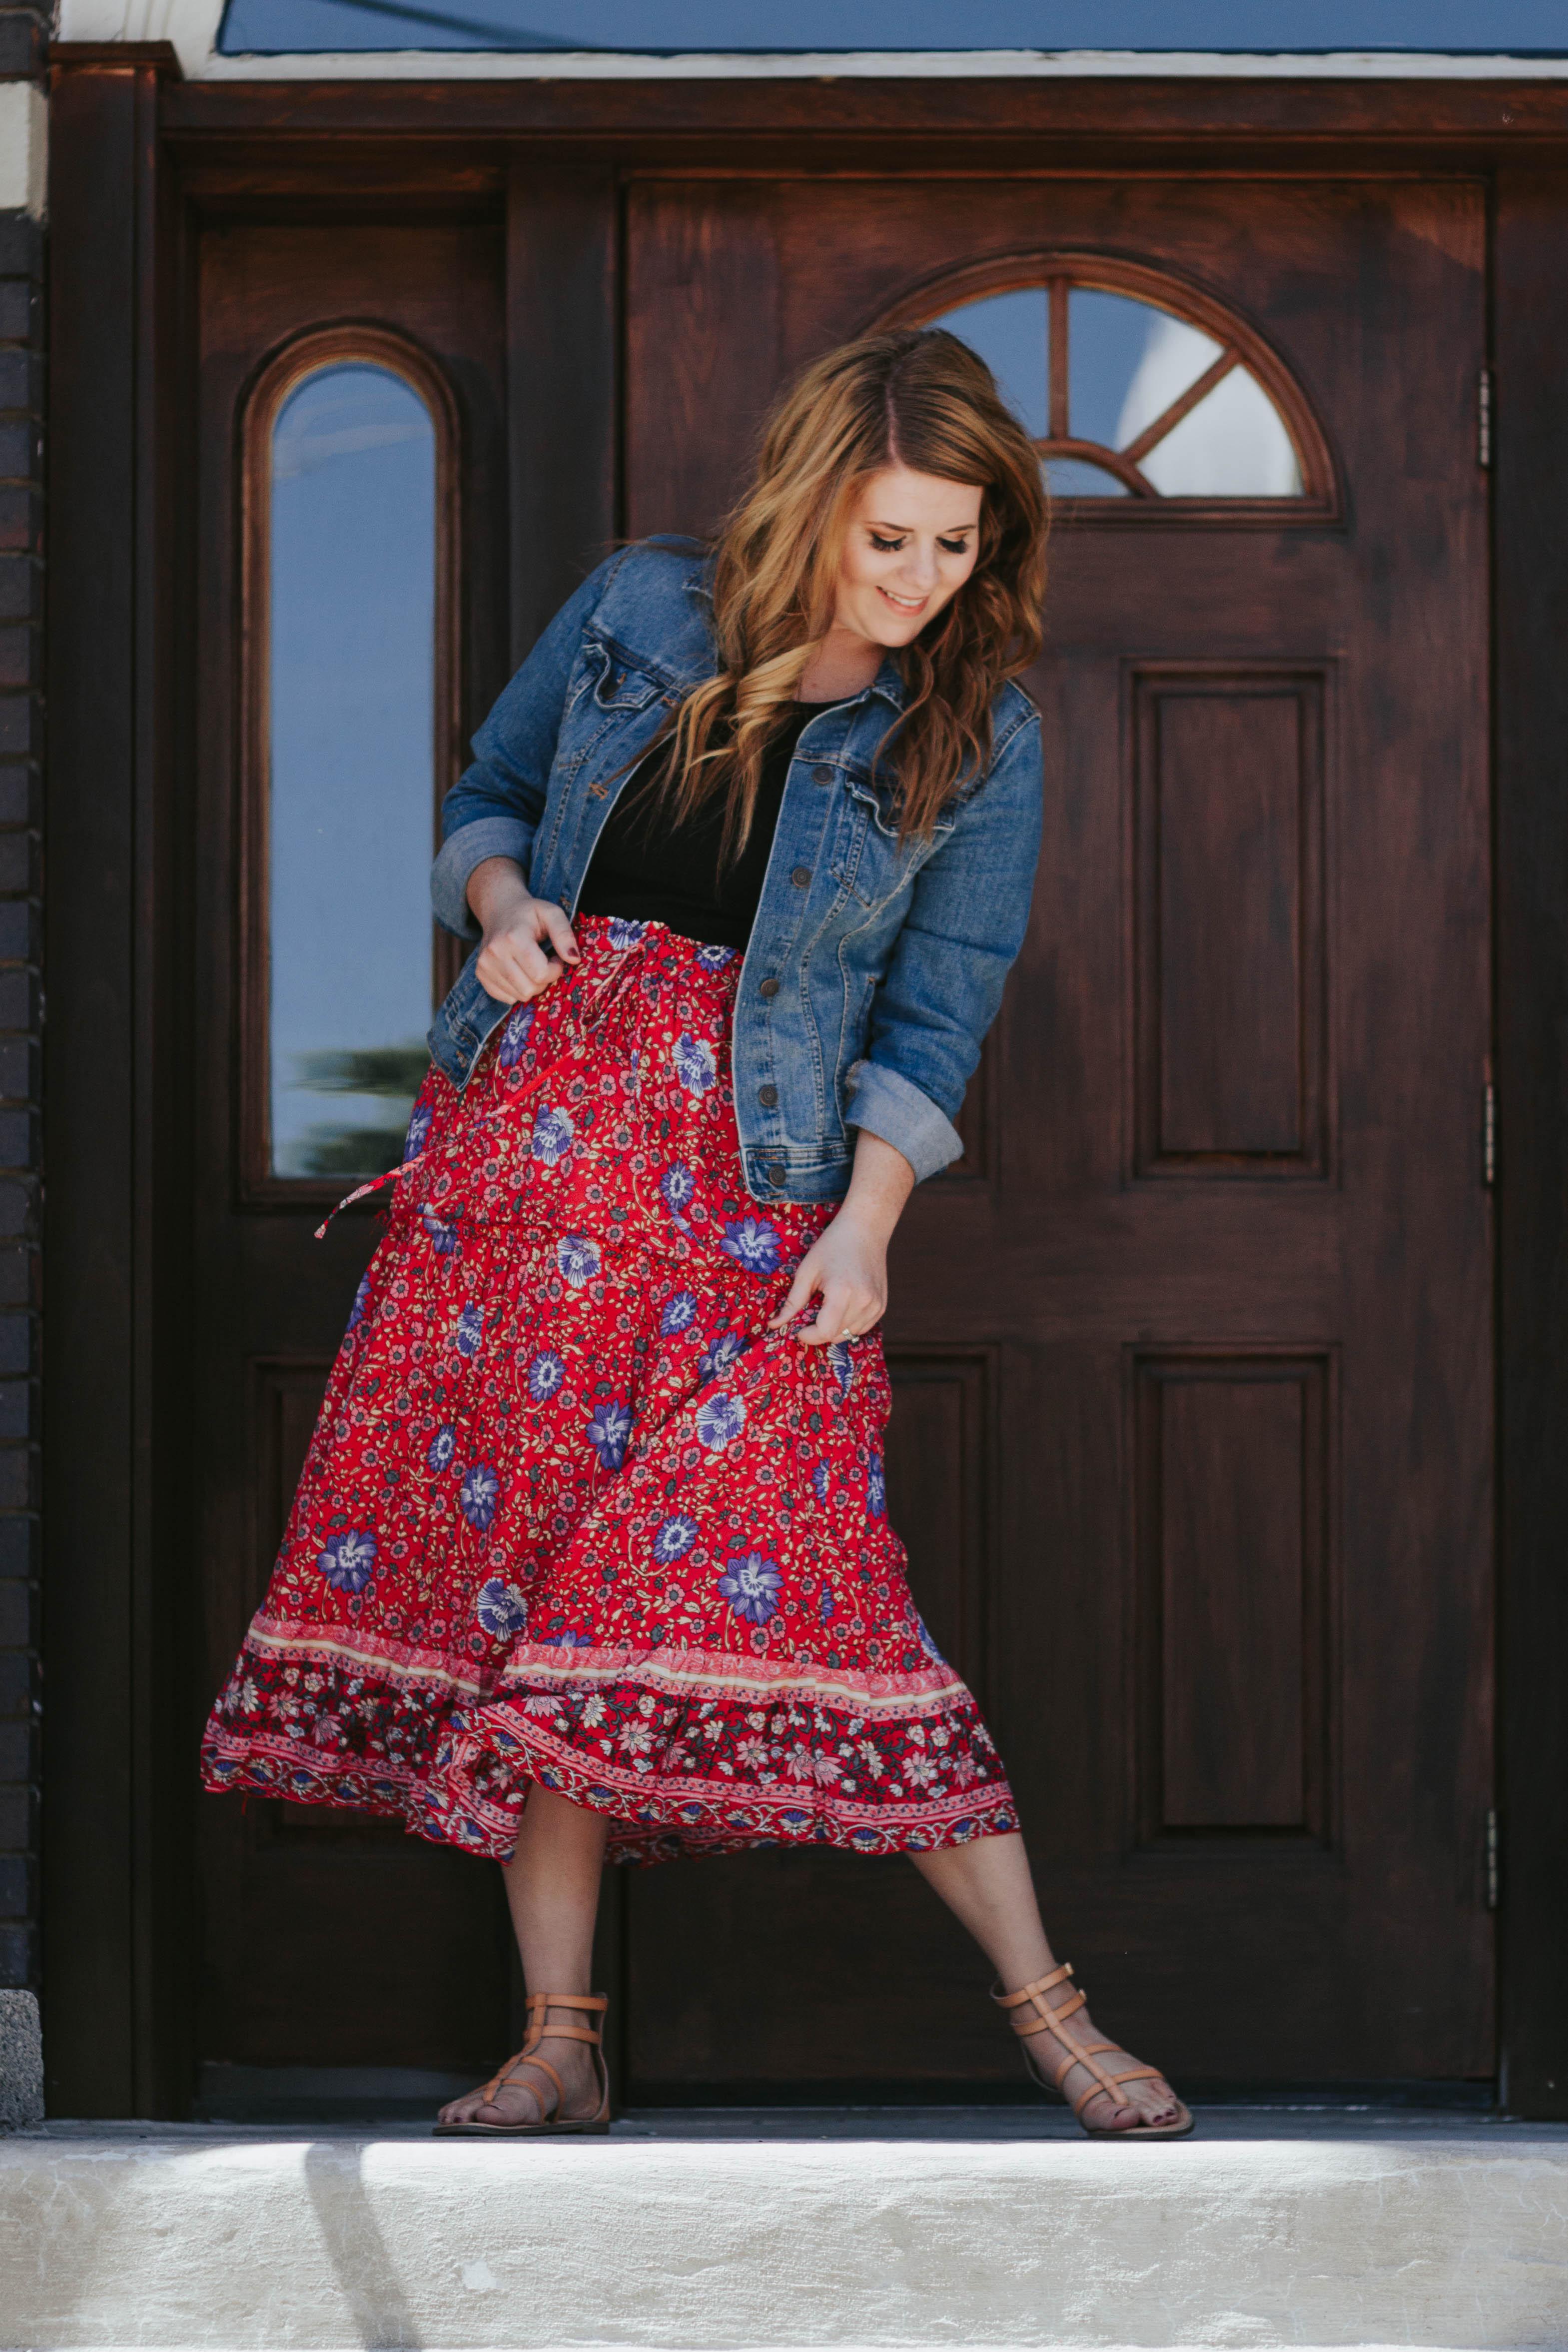 amazon Skirt